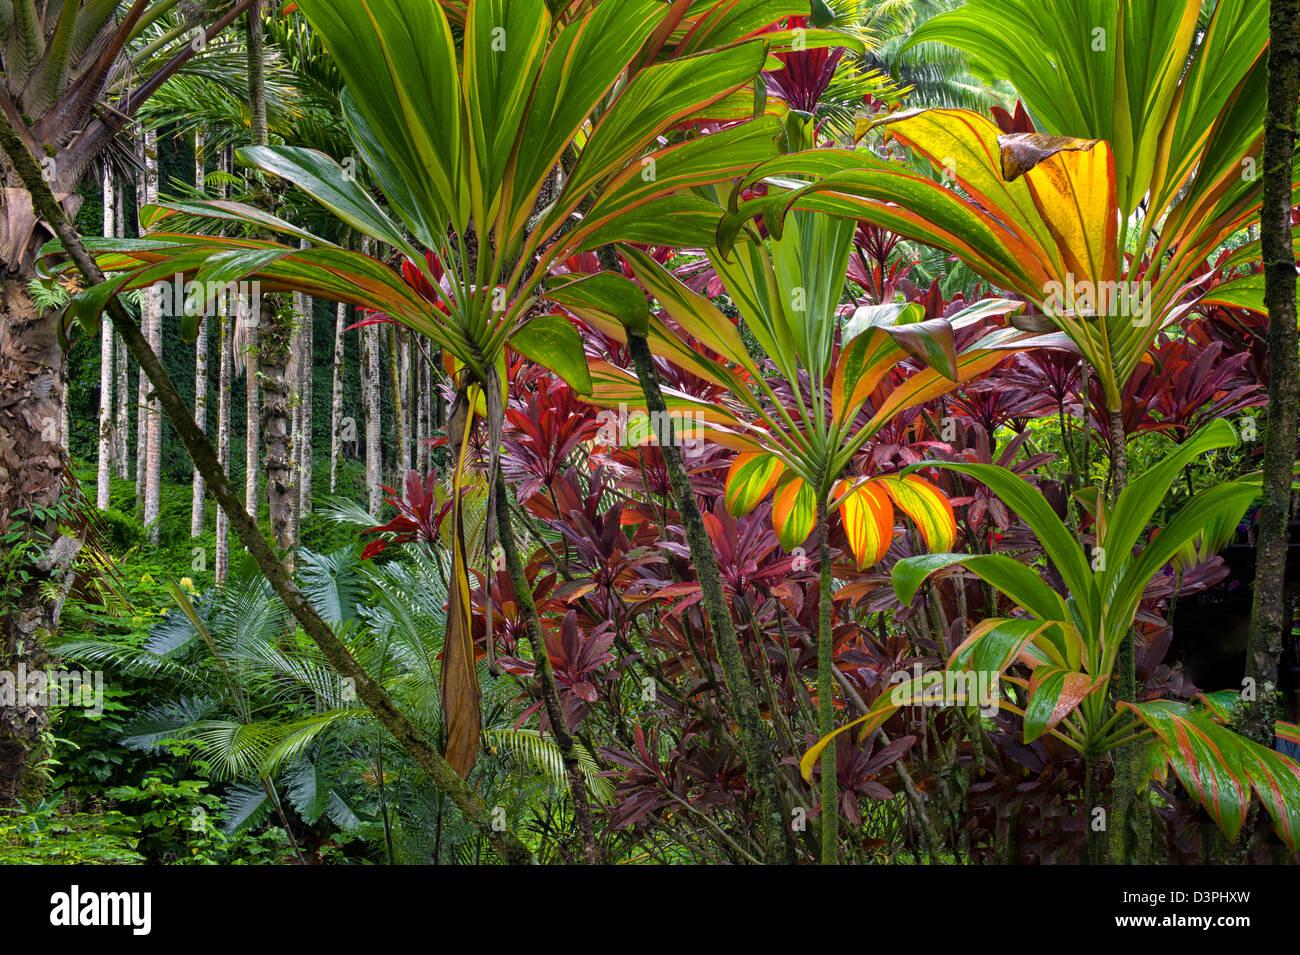 Ti Plants Hawaii Tropical Botanical Gardens Hawaii The Big Stock Photo Royalty Free Image